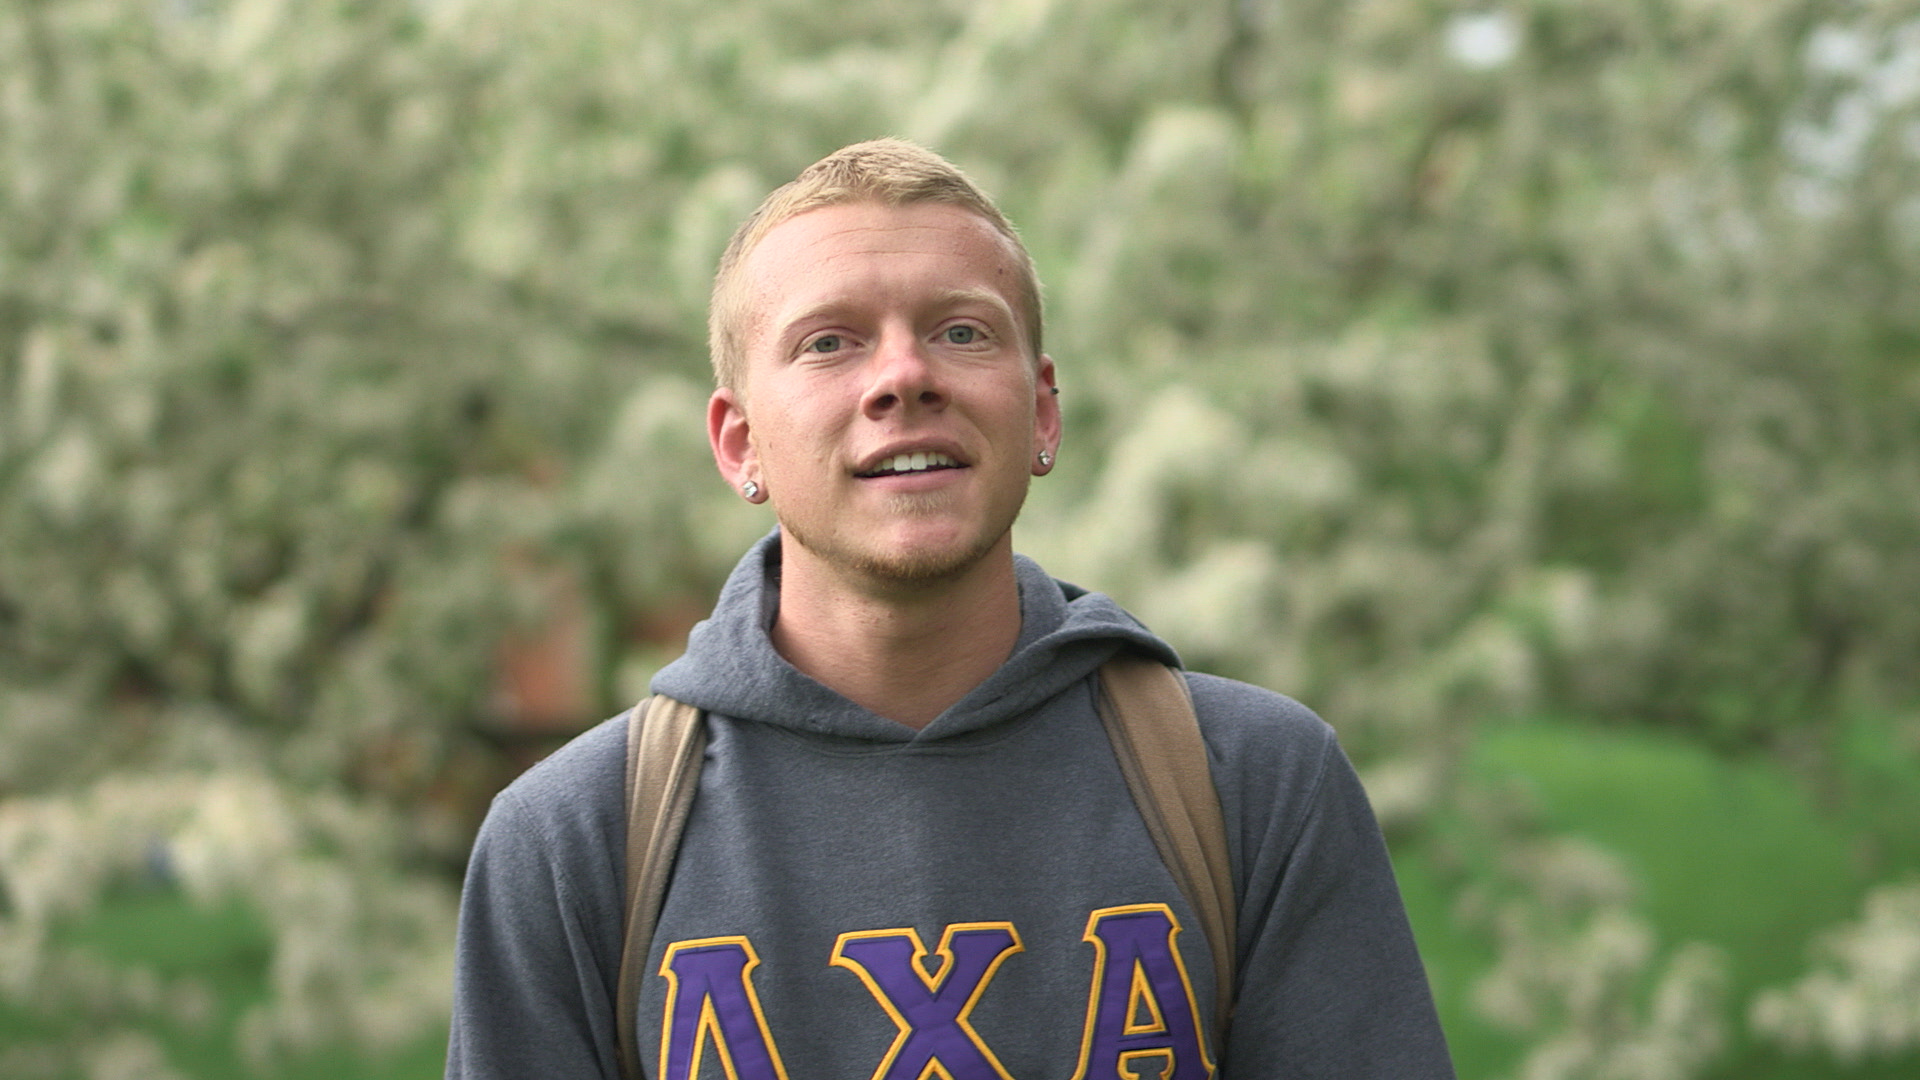 white male college student Elmhurst